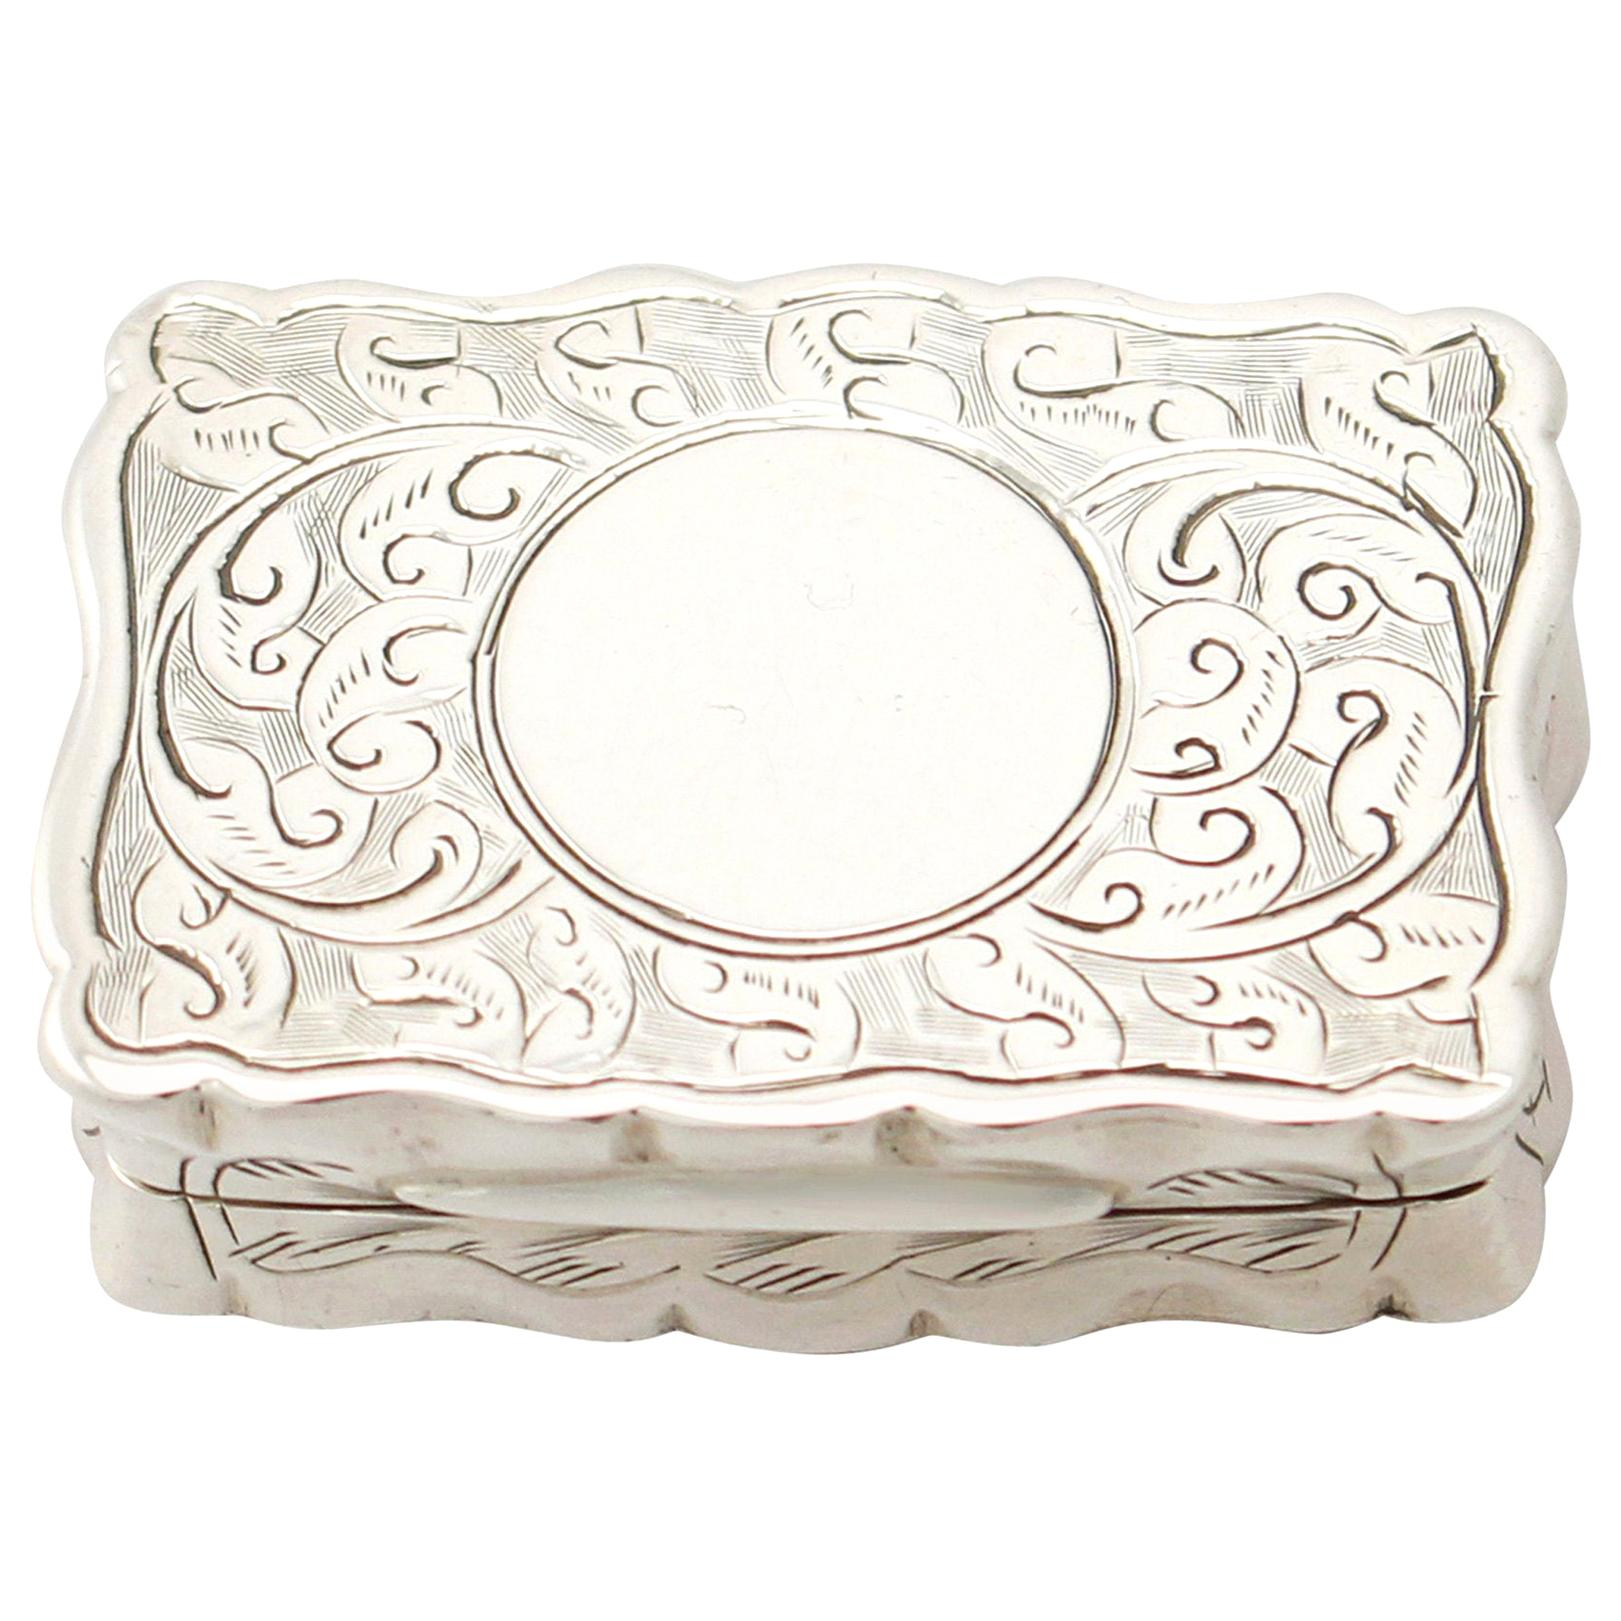 Antique Victorian English Sterling Silver Vinaigrette